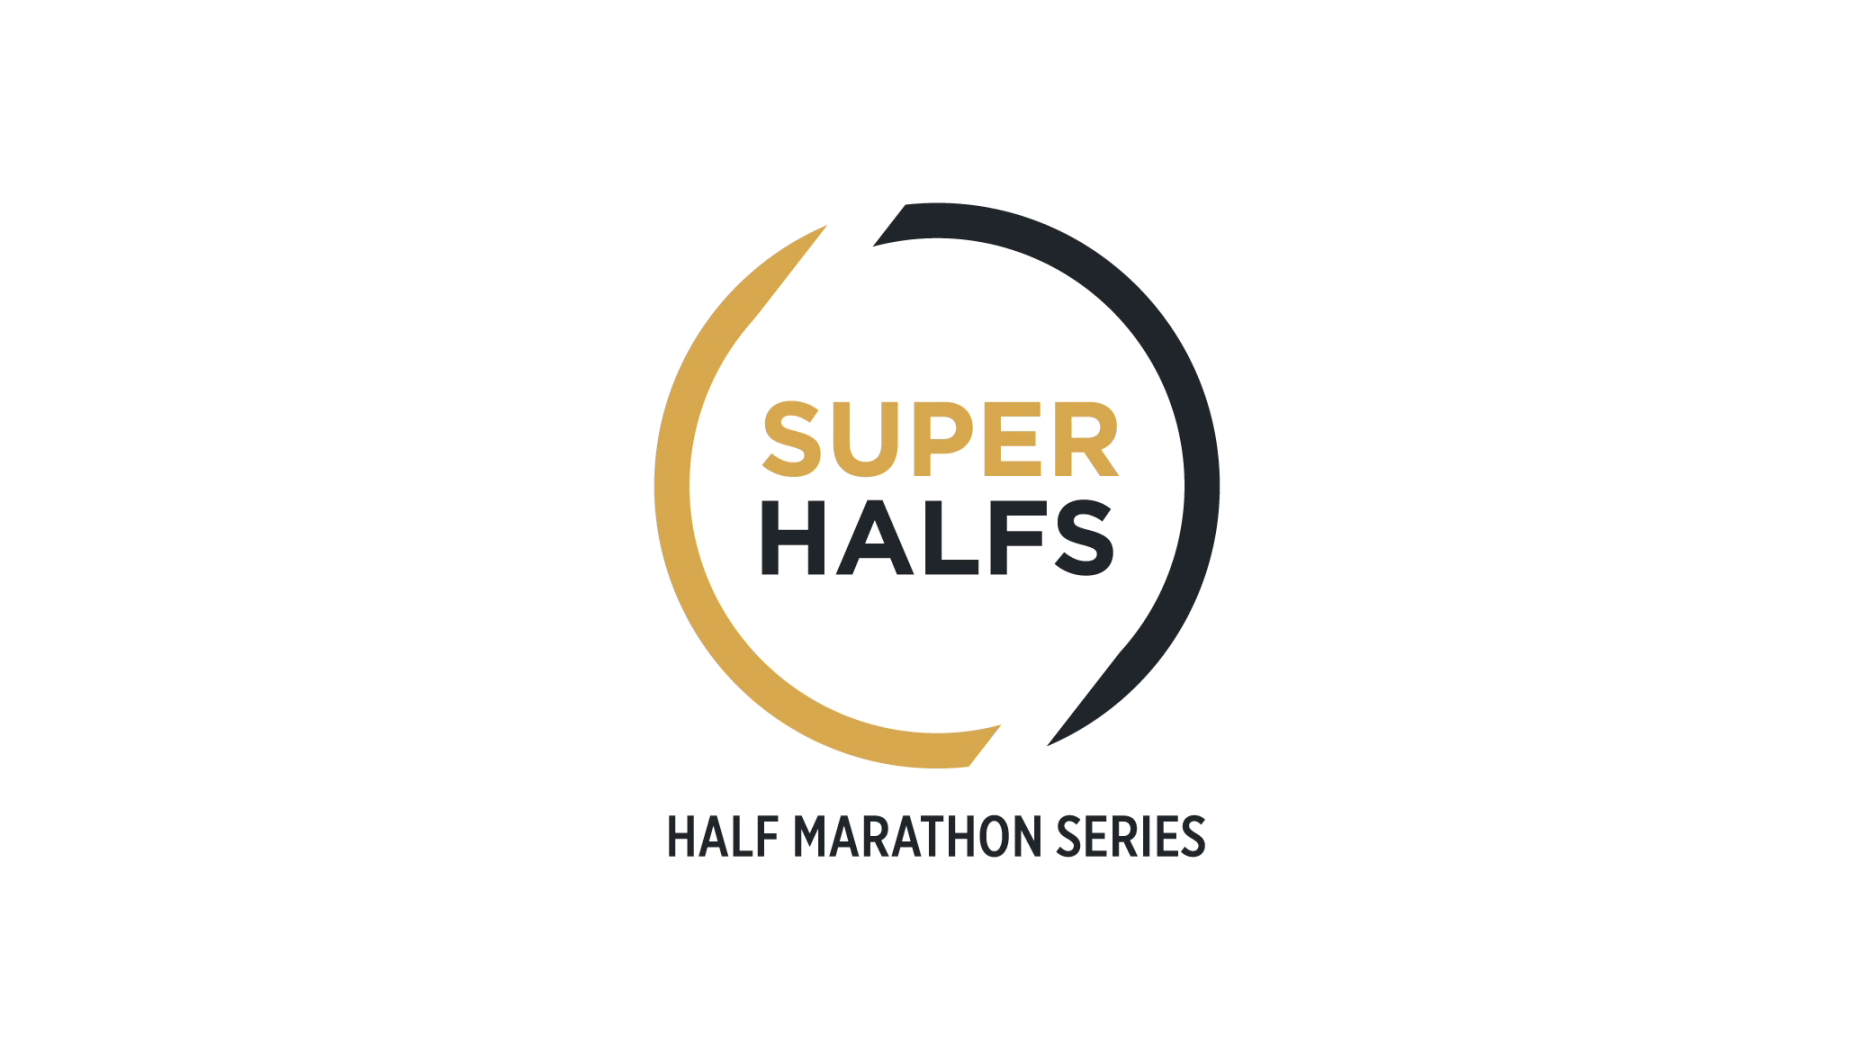 SUPER HALFS